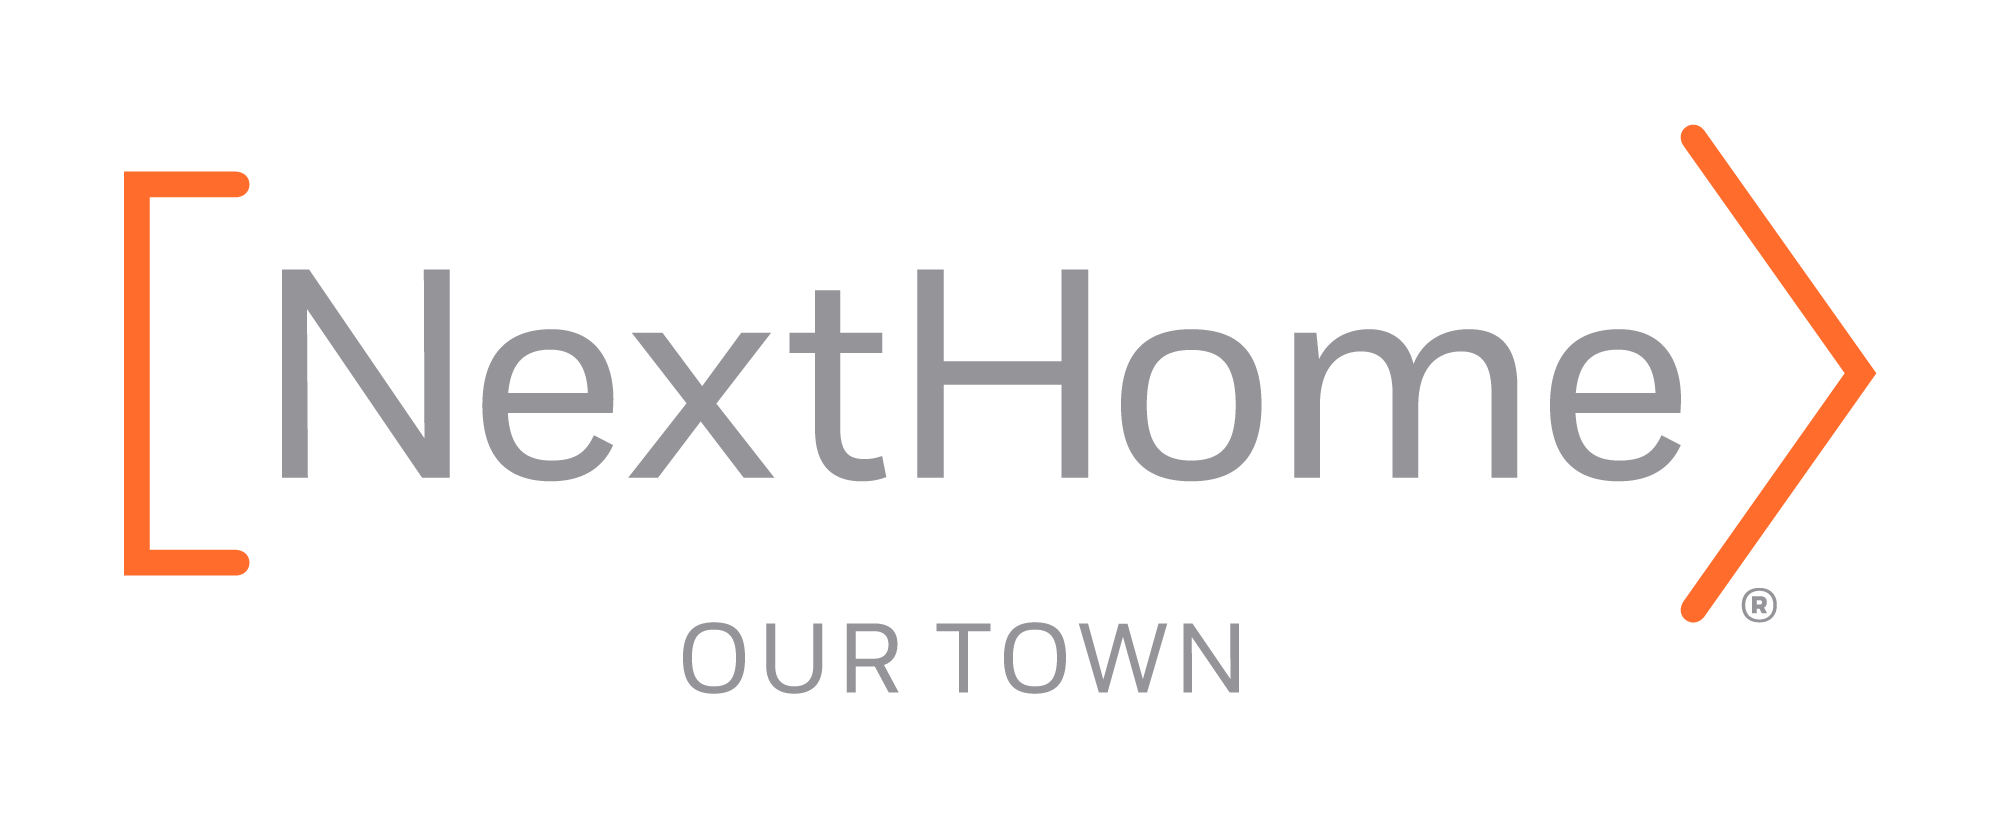 NextHome Our Town - Waco Home Team